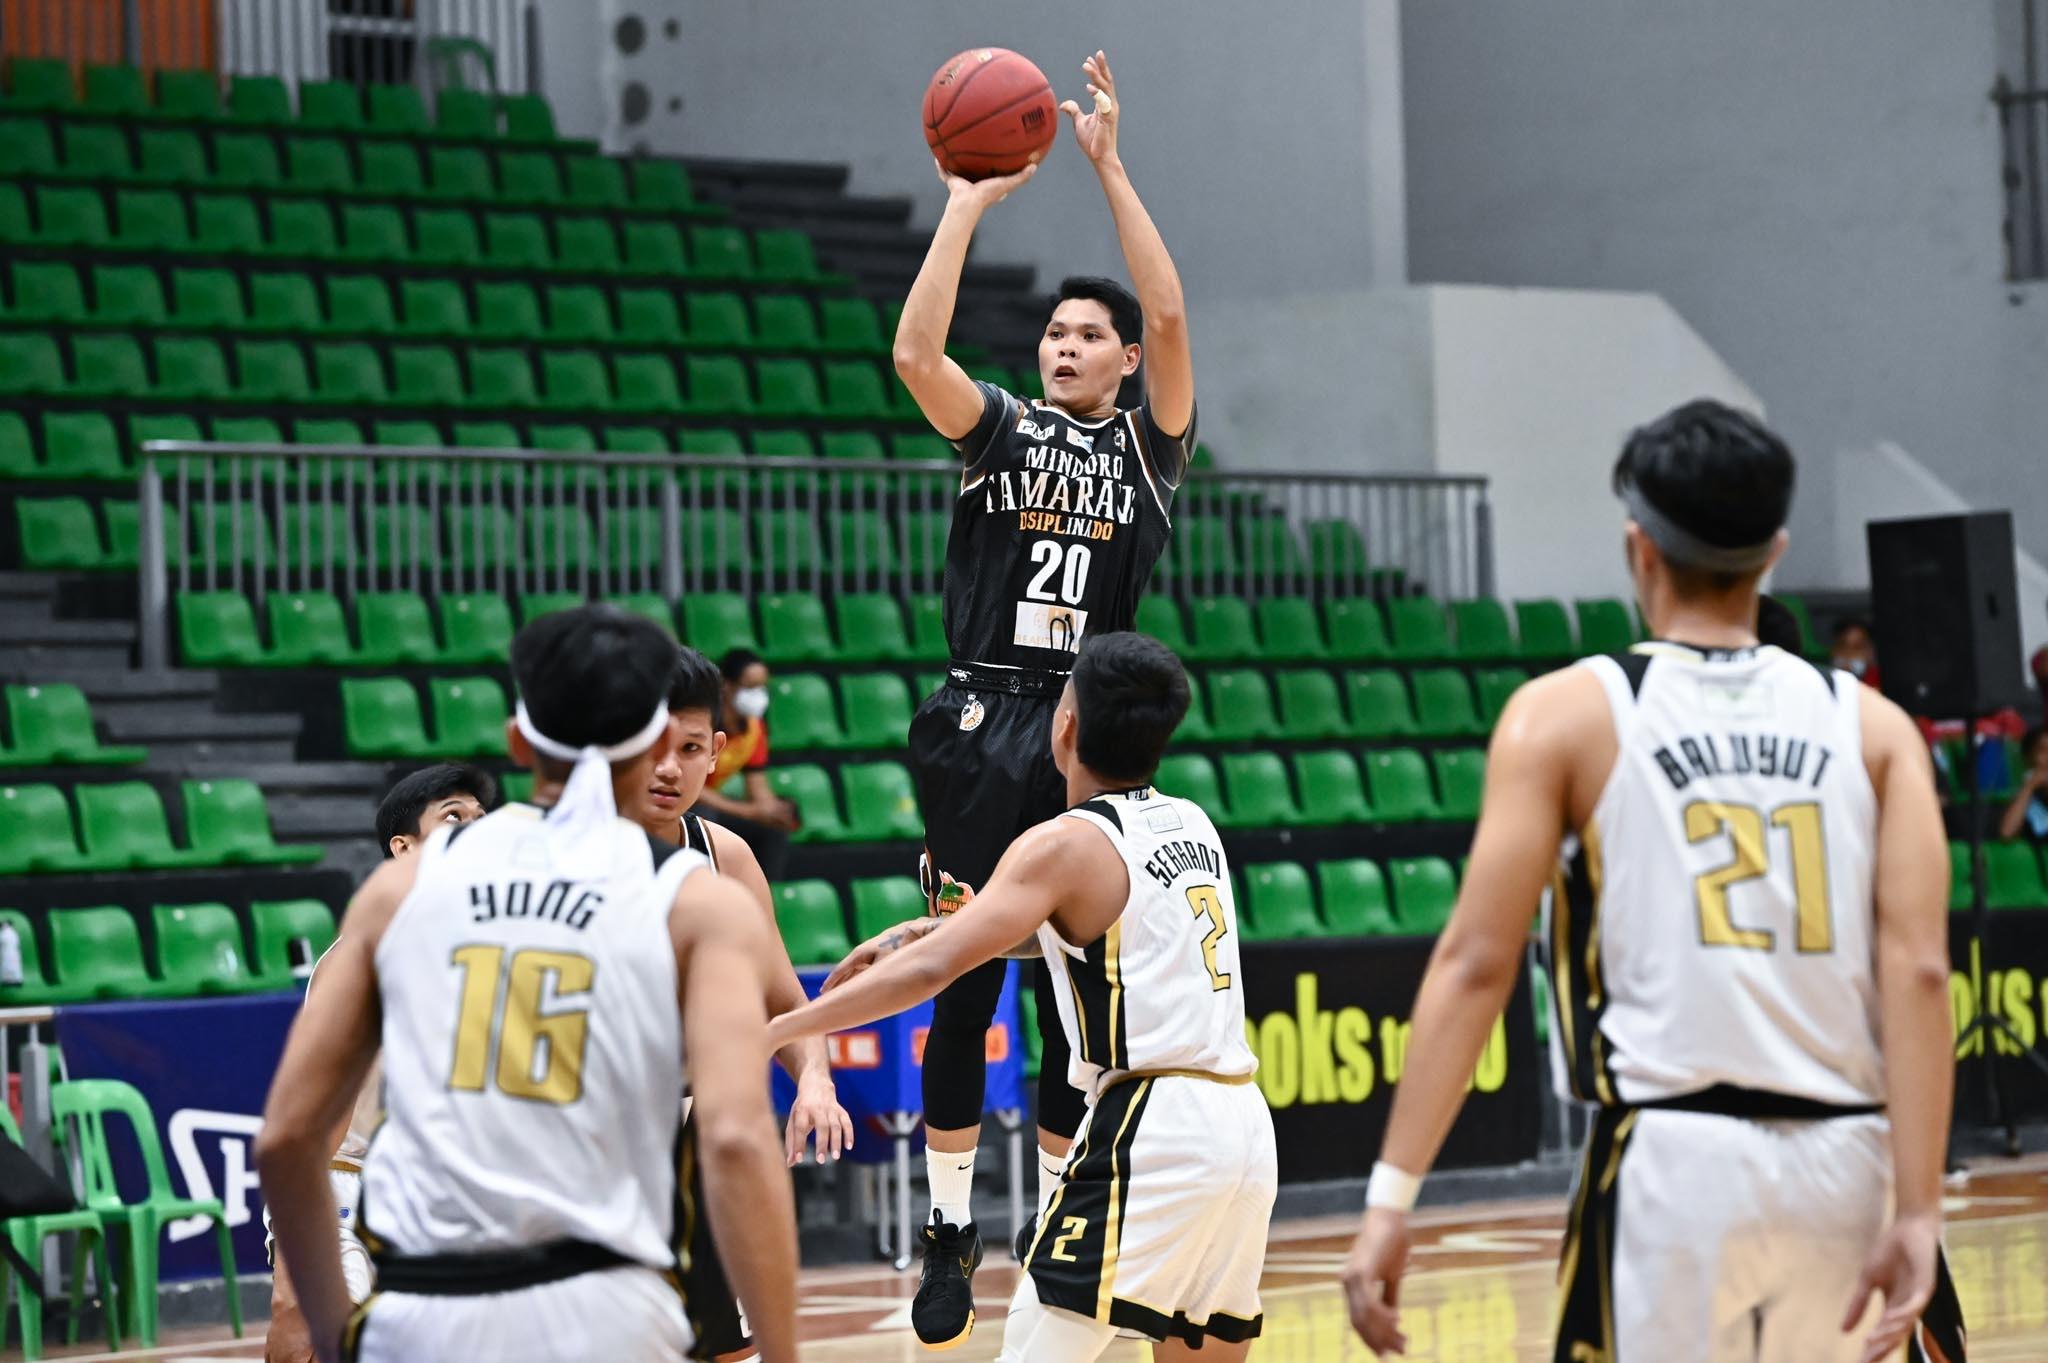 2021-Chooks-NBL-Pampanga-vs-Mindoro-RODEL-VAYGAN Serrano shines as Pampanga dehorns Mindoro to open NBL back-to-back bid Basketball NBL News  - philippine sports news